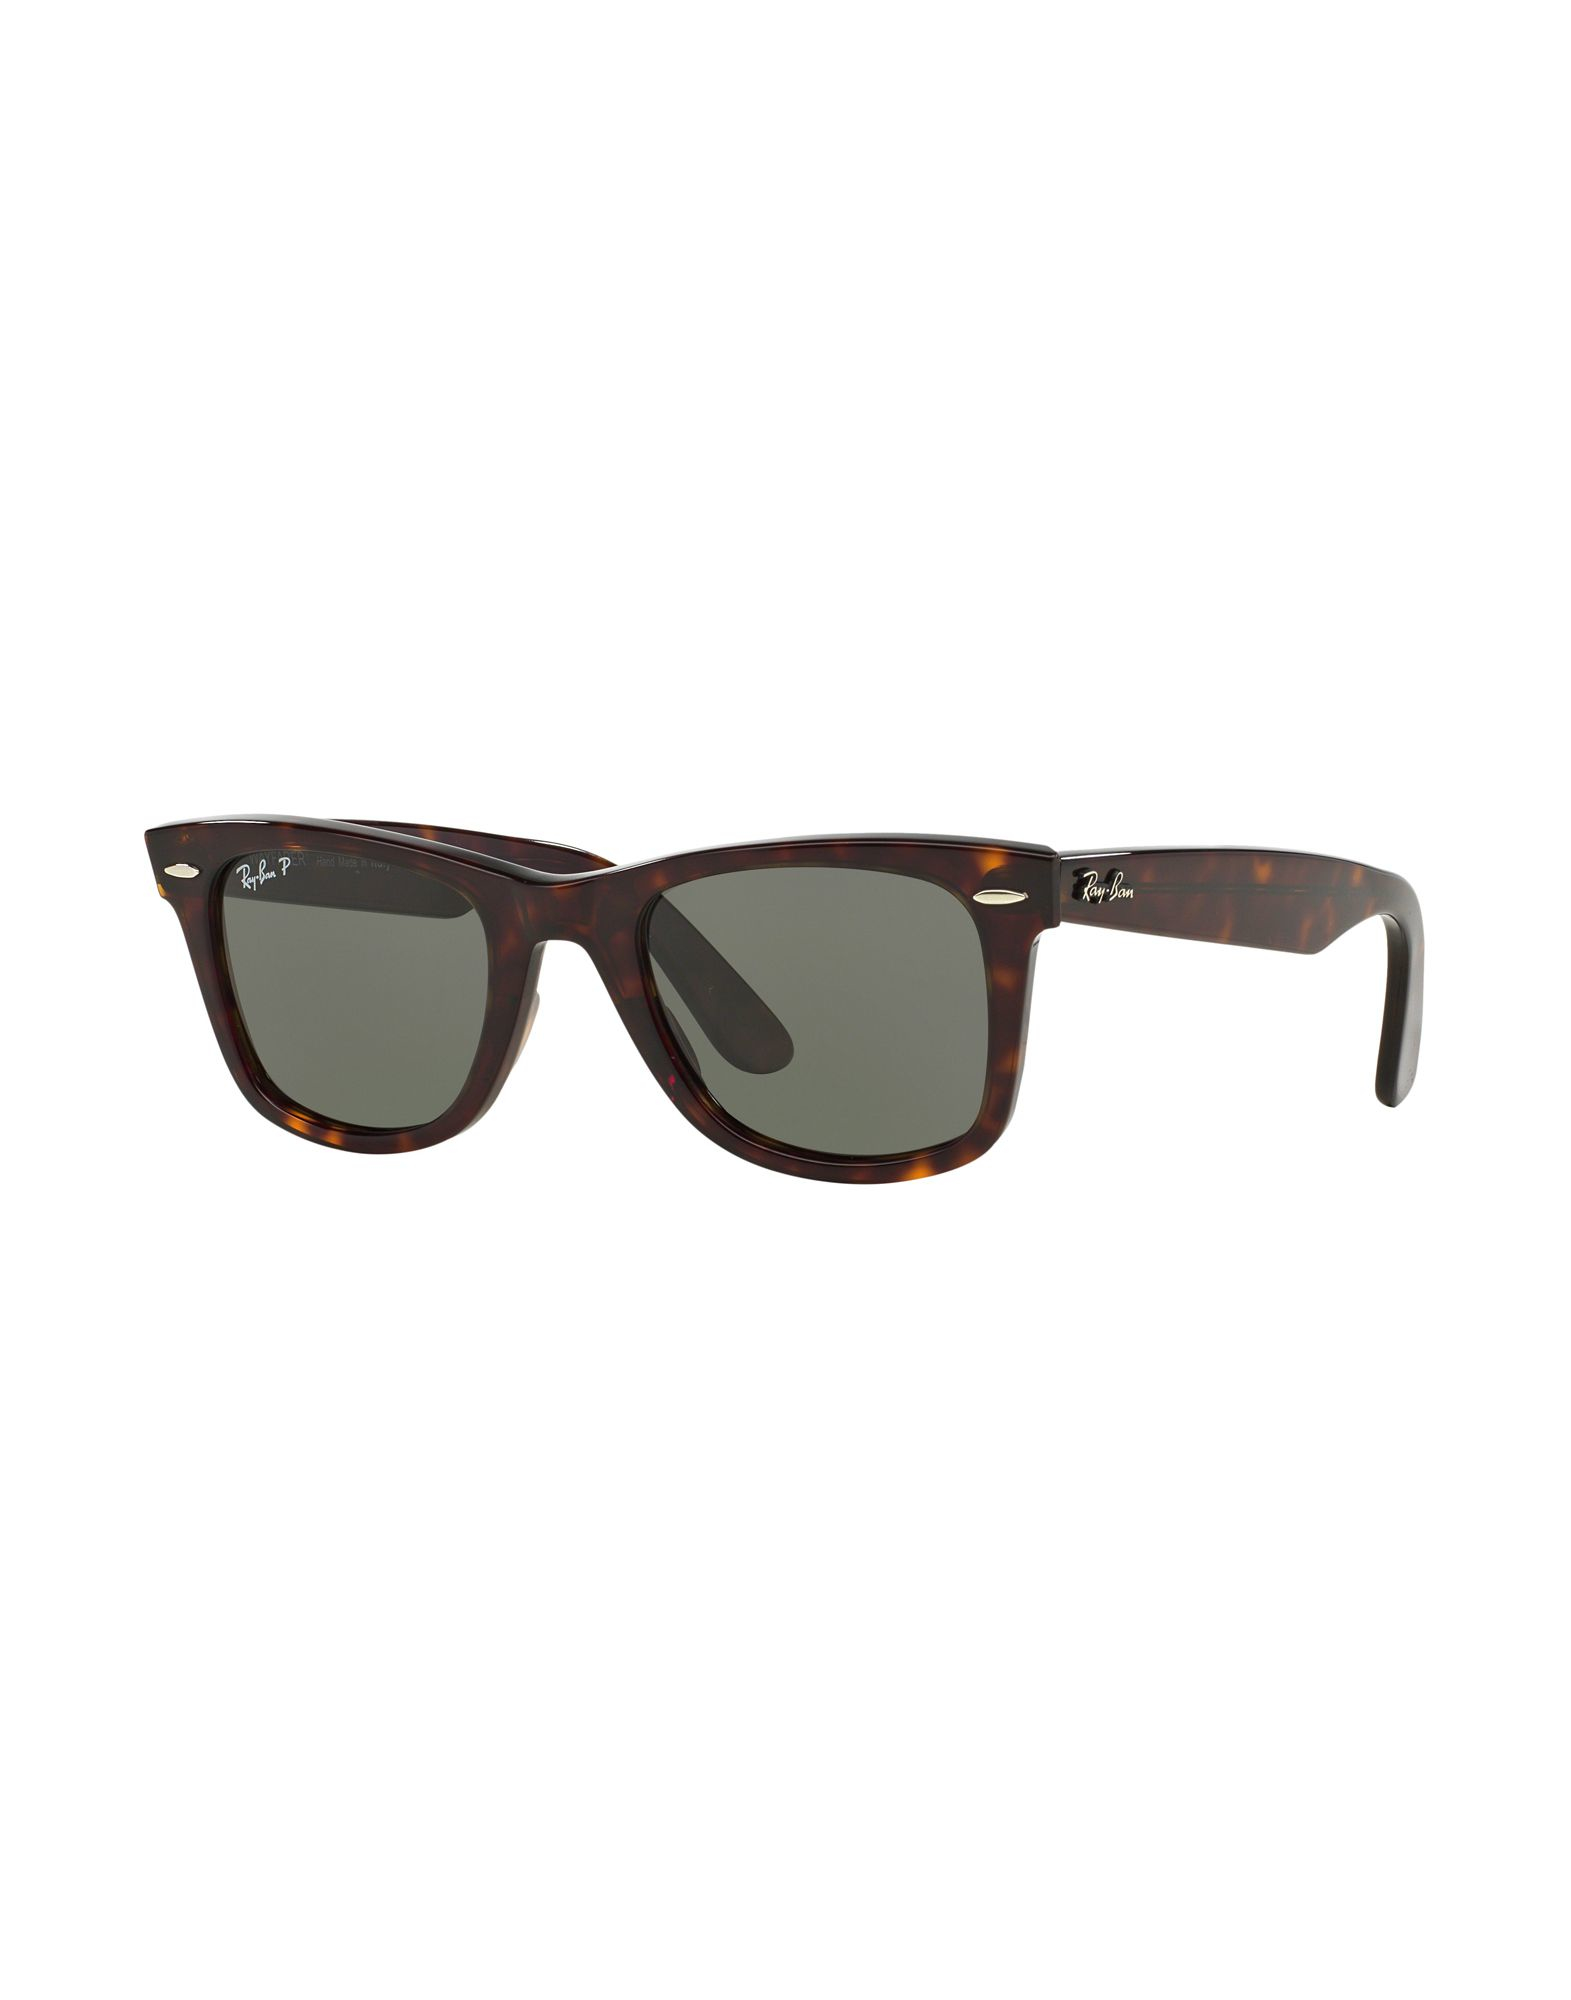 Ray-ban Sunglasses in Brown (Dark brown) Lyst